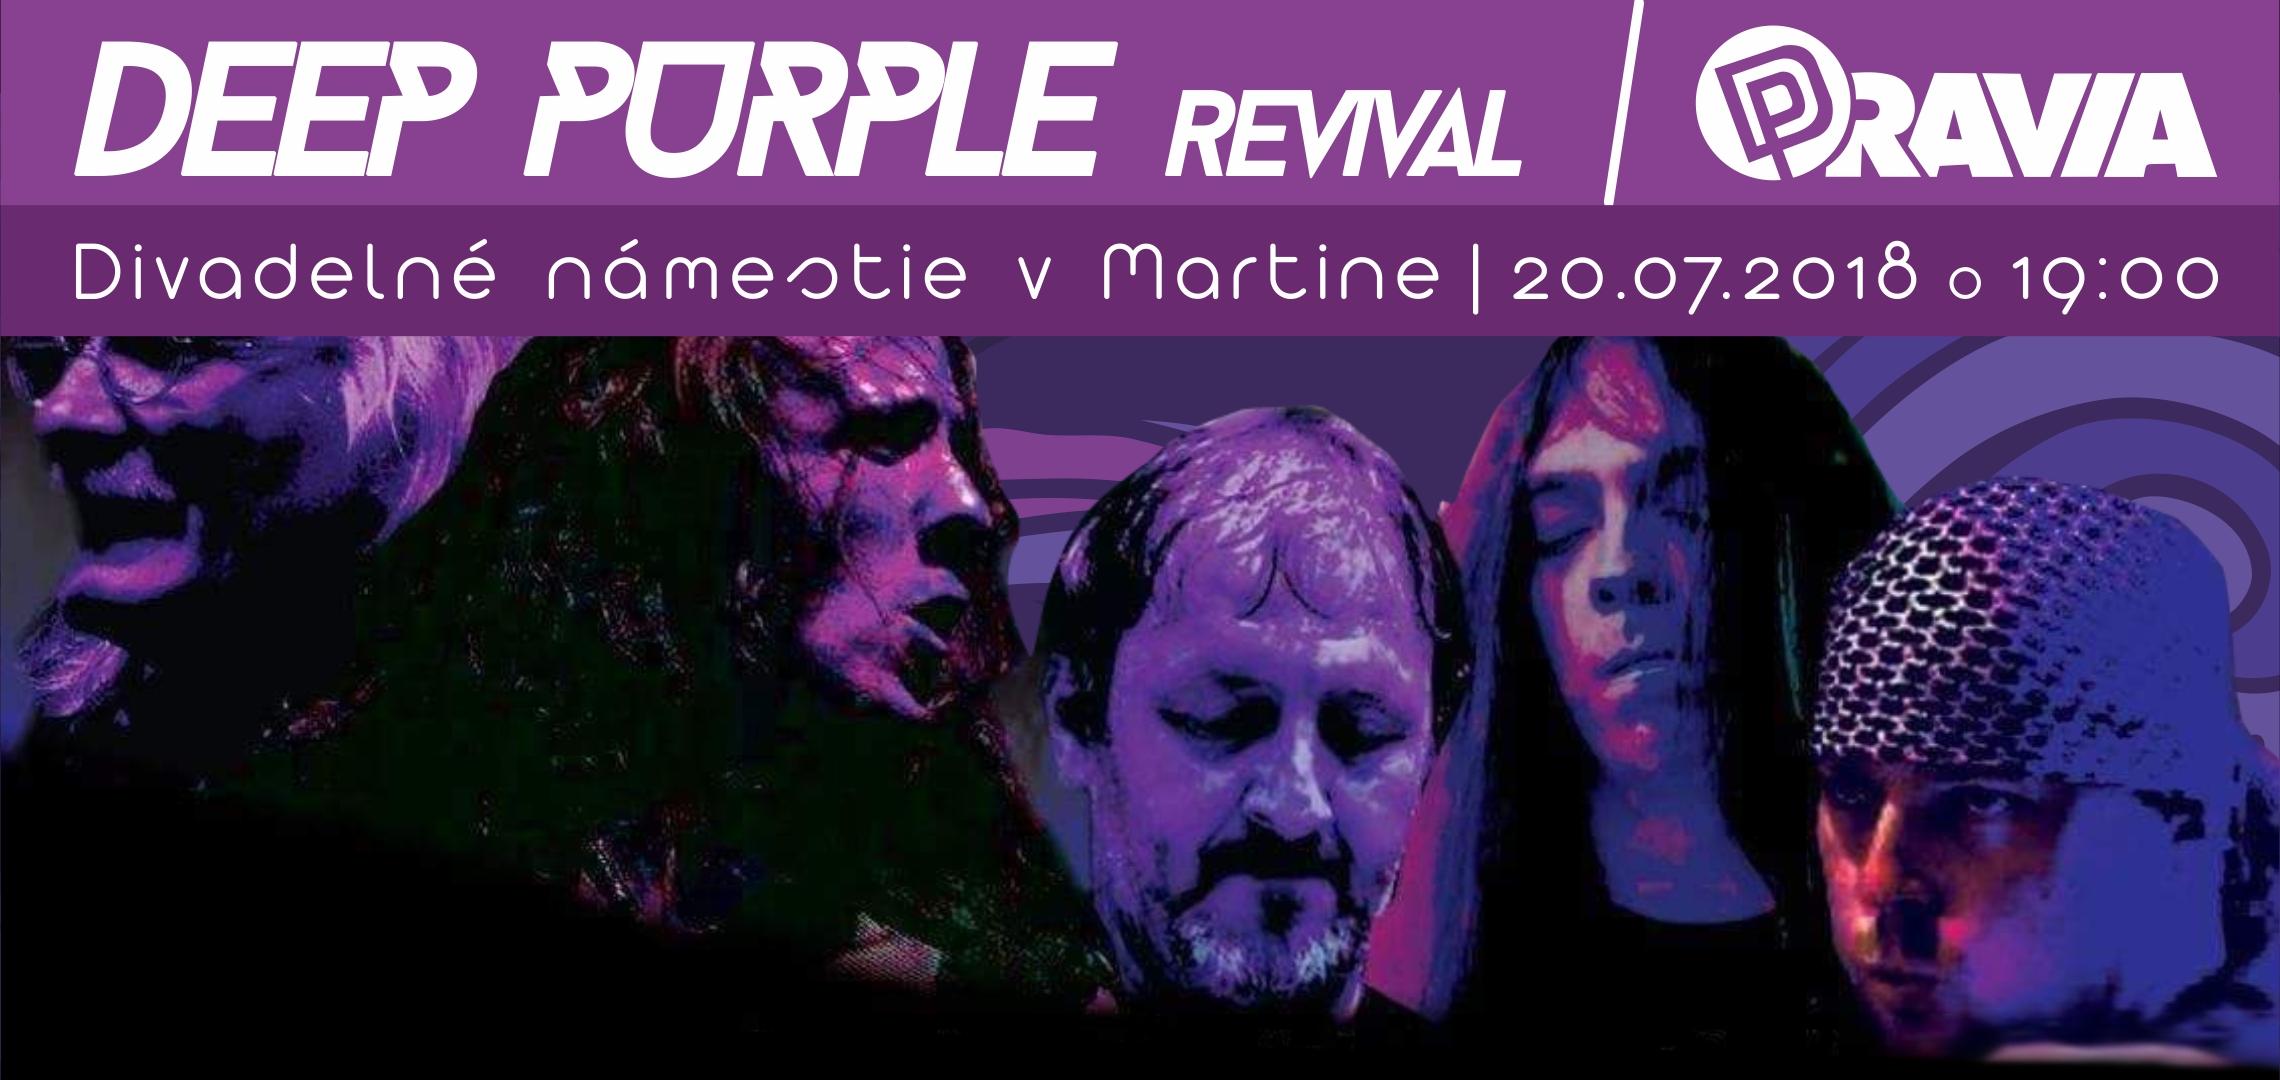 Deep Purple Revival